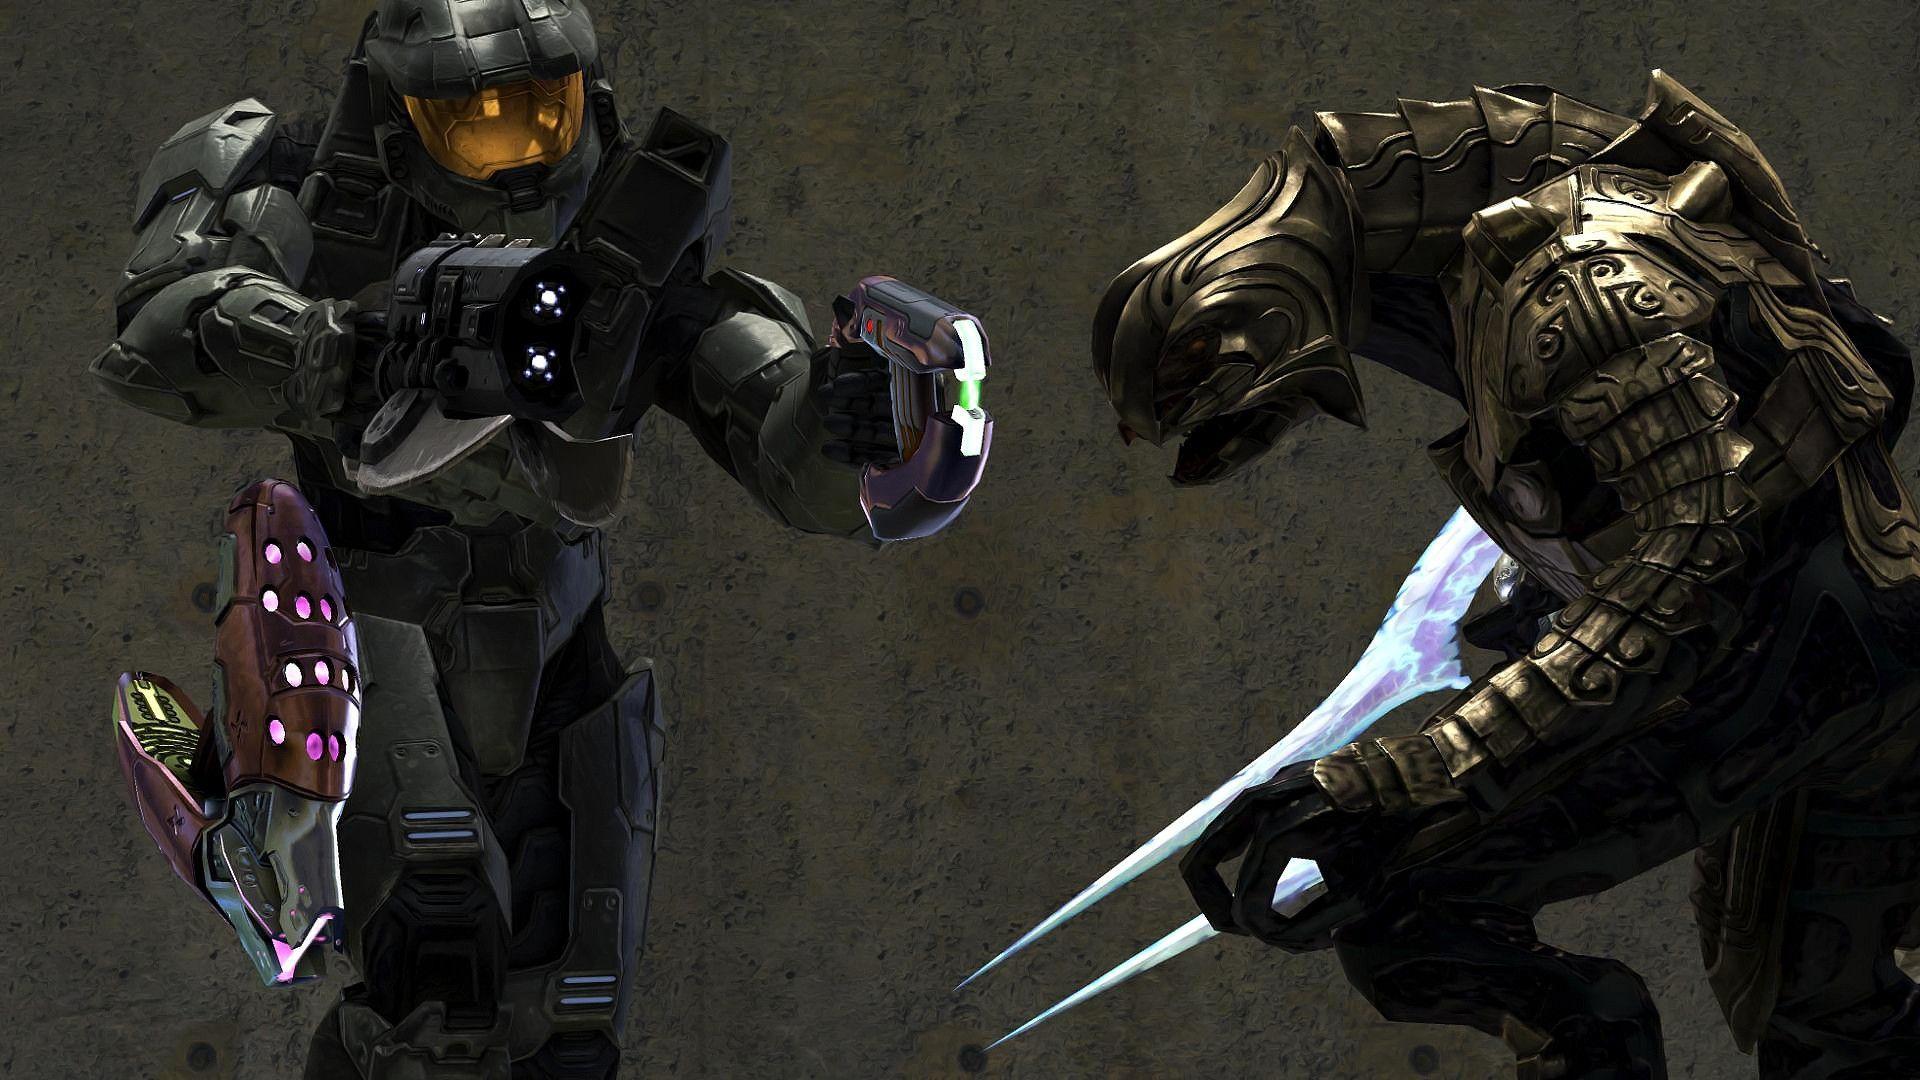 1920x1080 Halo 5 Agent Locke Arbiter Hunting Master Chief